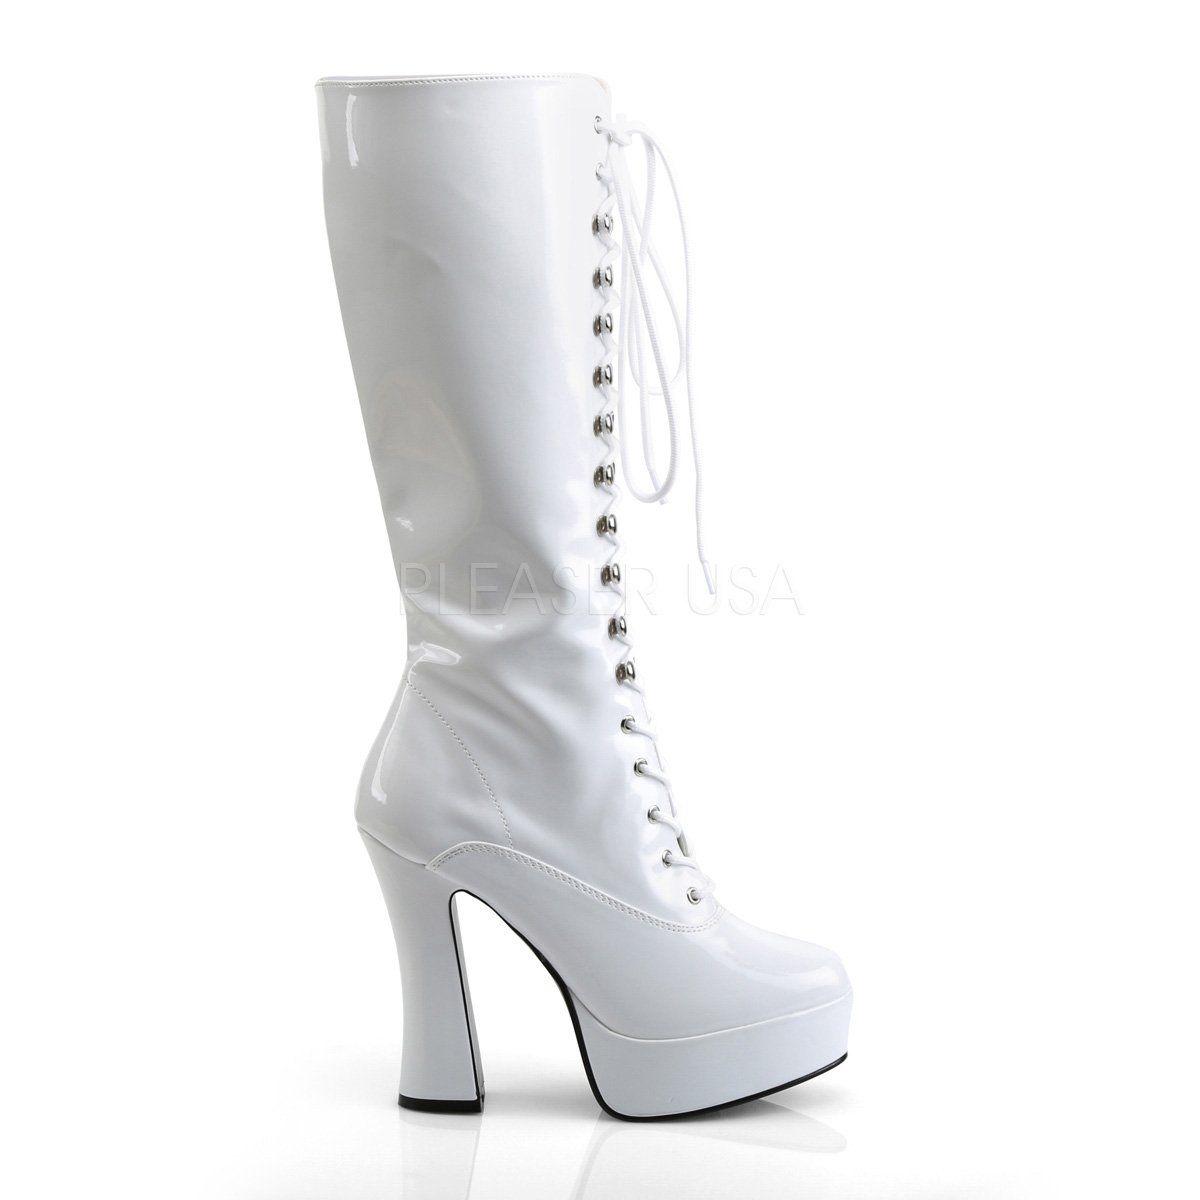 Pleaser Electra 2020 Black Patent Lace-Up Stack Heel Knee High Platform Boots